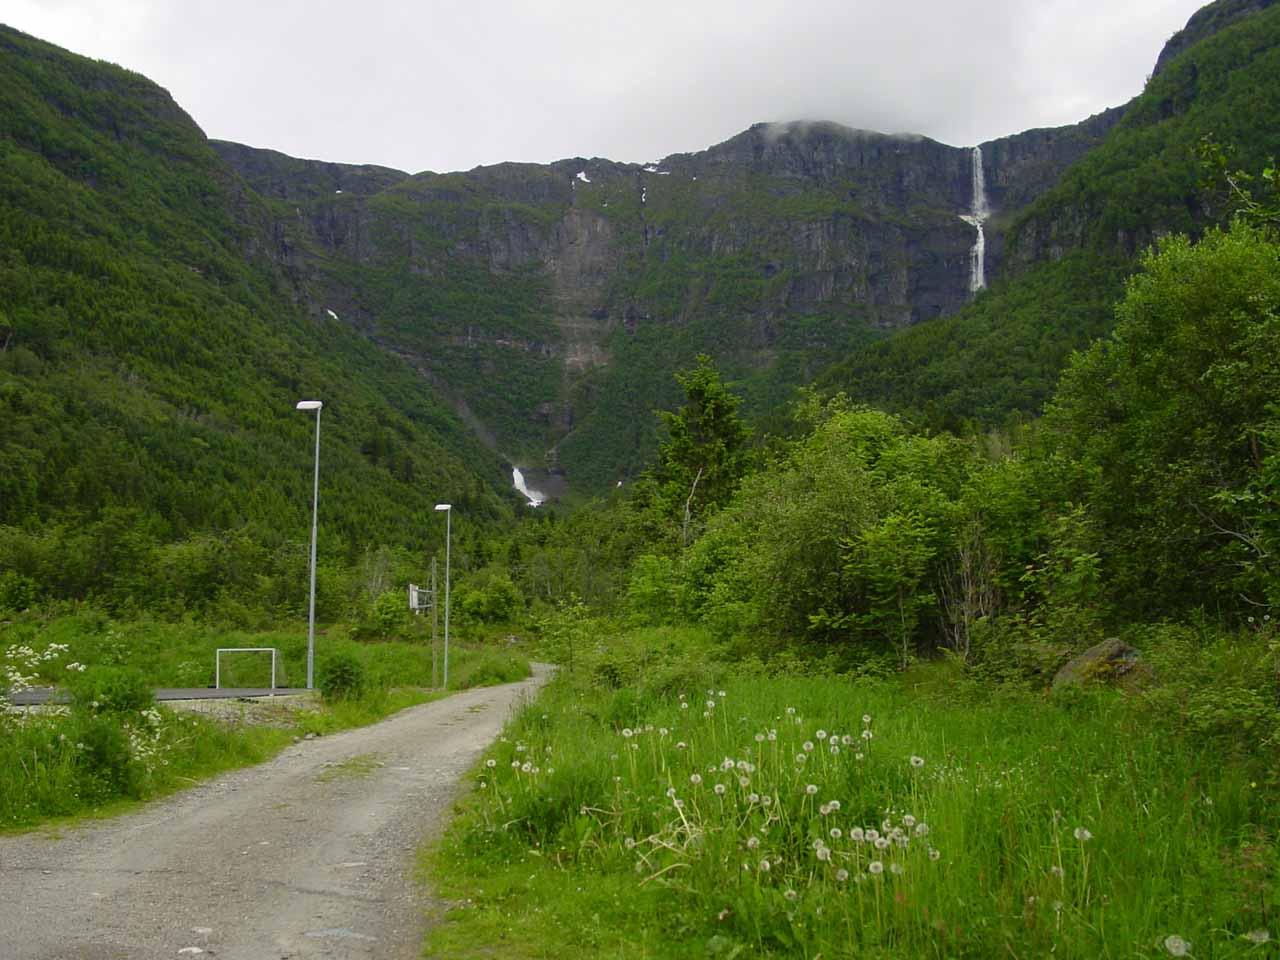 View of the waterfall pair Skrikjofossen (right) and Opofossen (left) seen from the school in Elvedalen